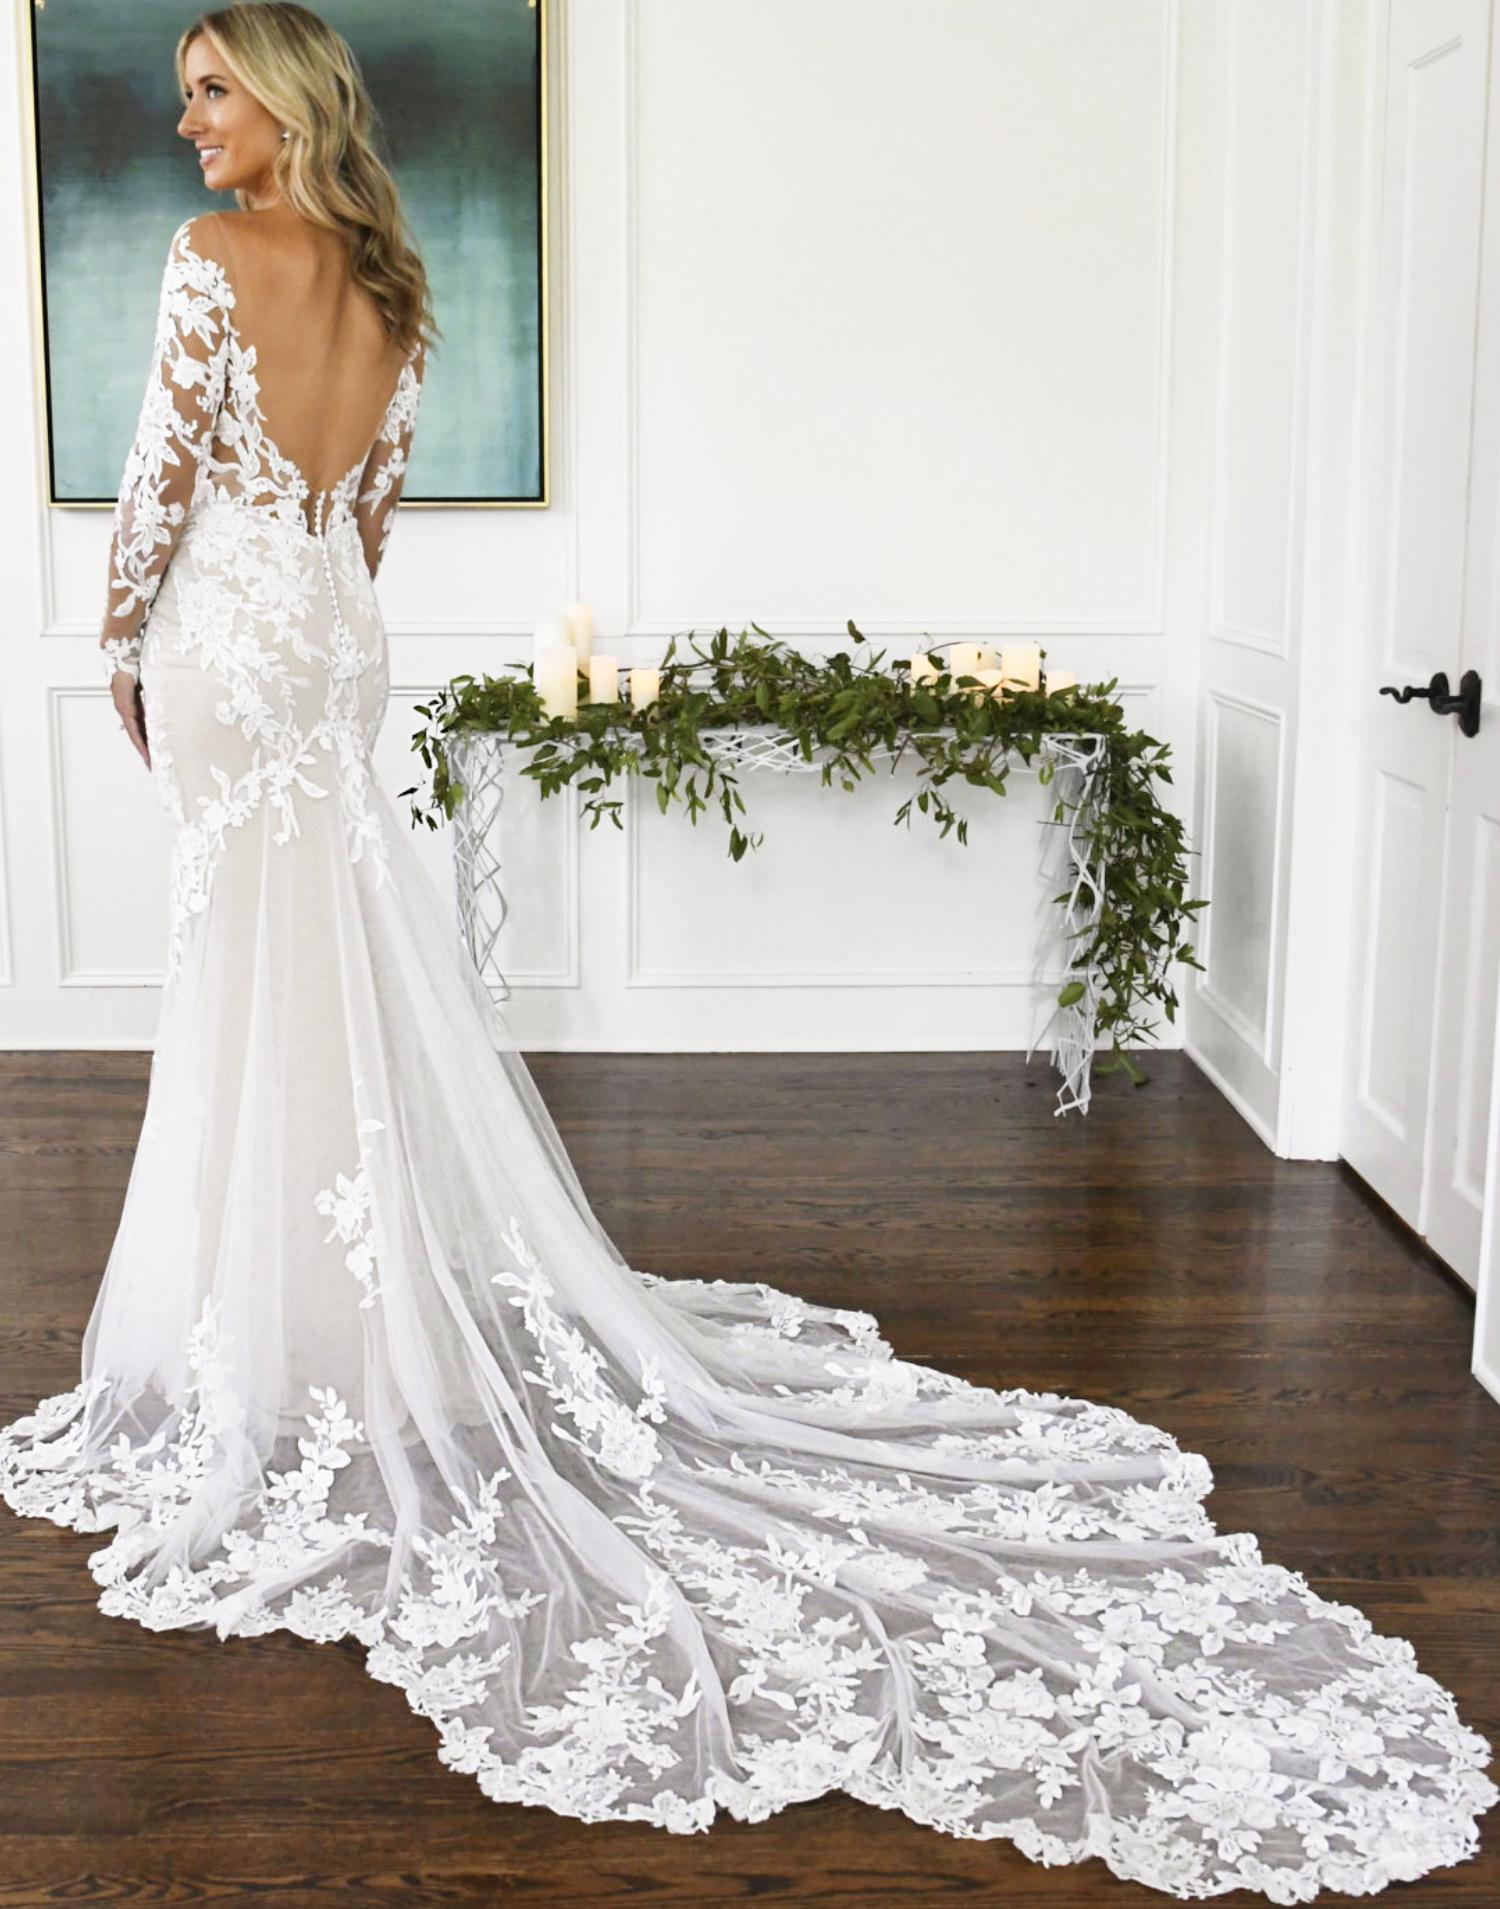 D3284 – Essense of Australia Wedding Dress Collection – Front View